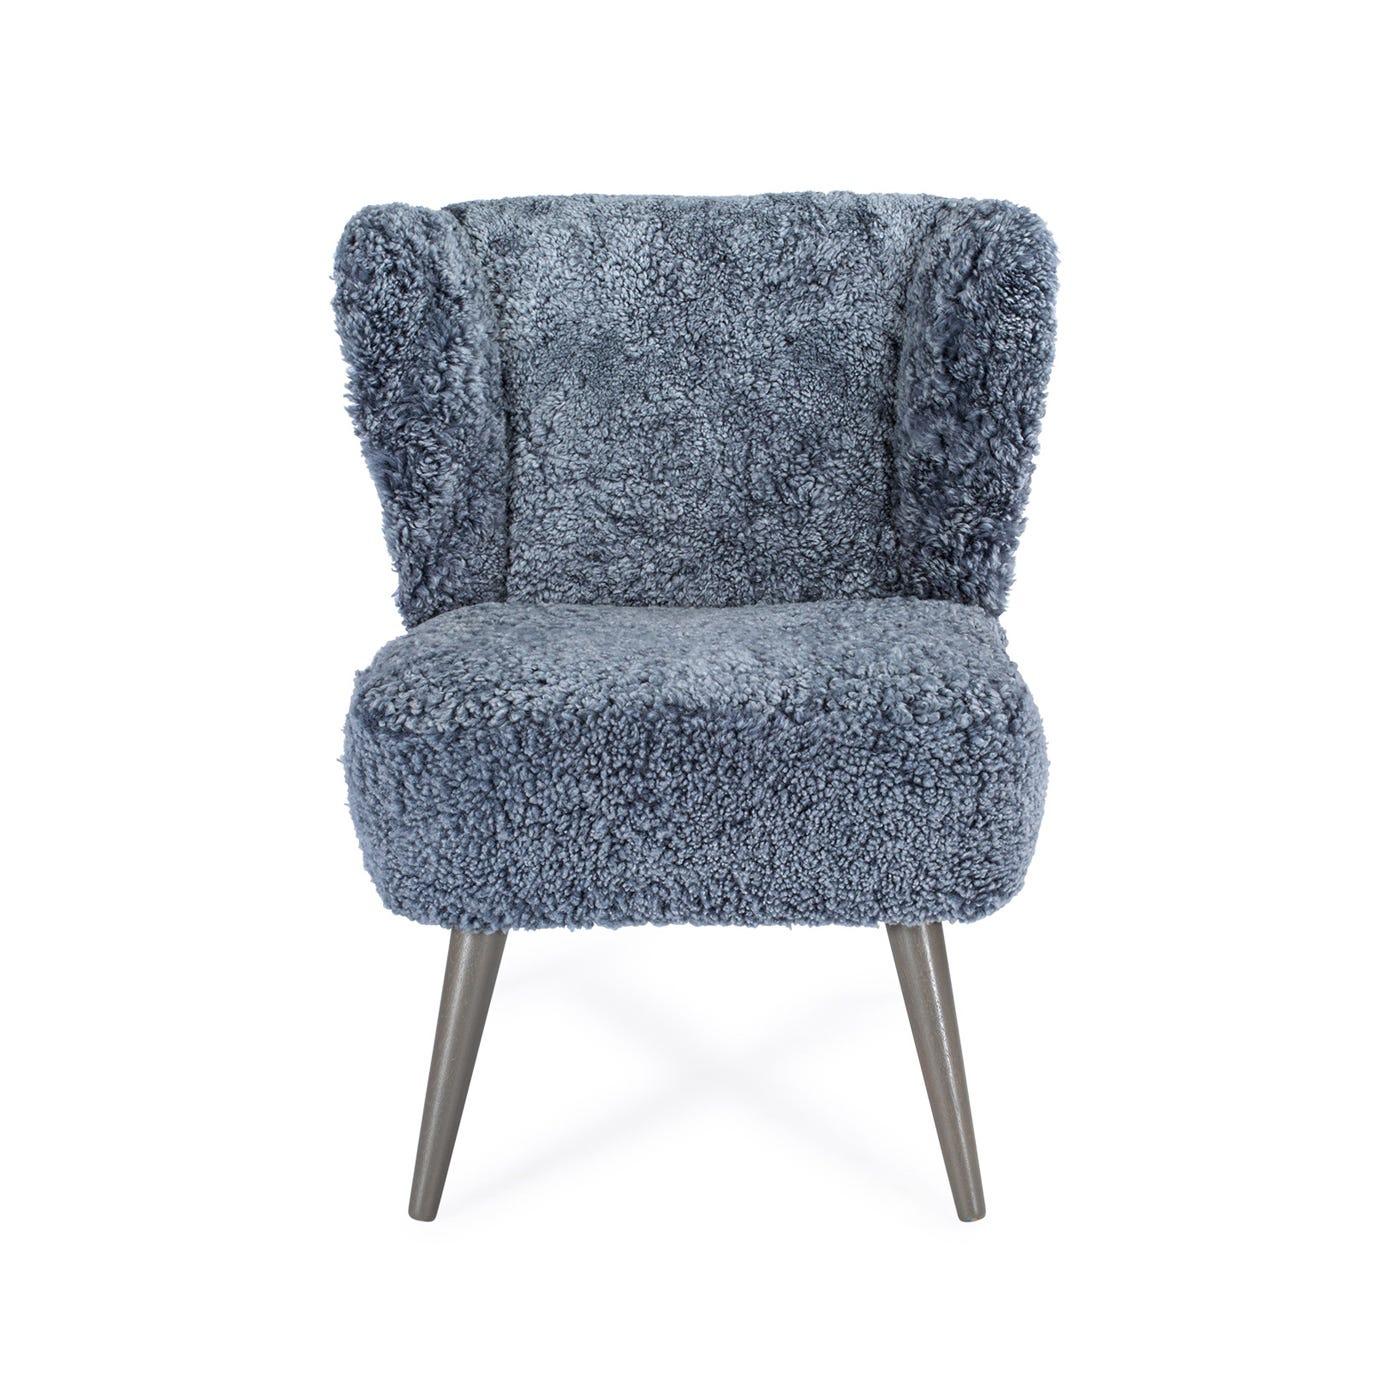 Ziggy Chair Blue Grey Sheepskin Pale Grey Legs